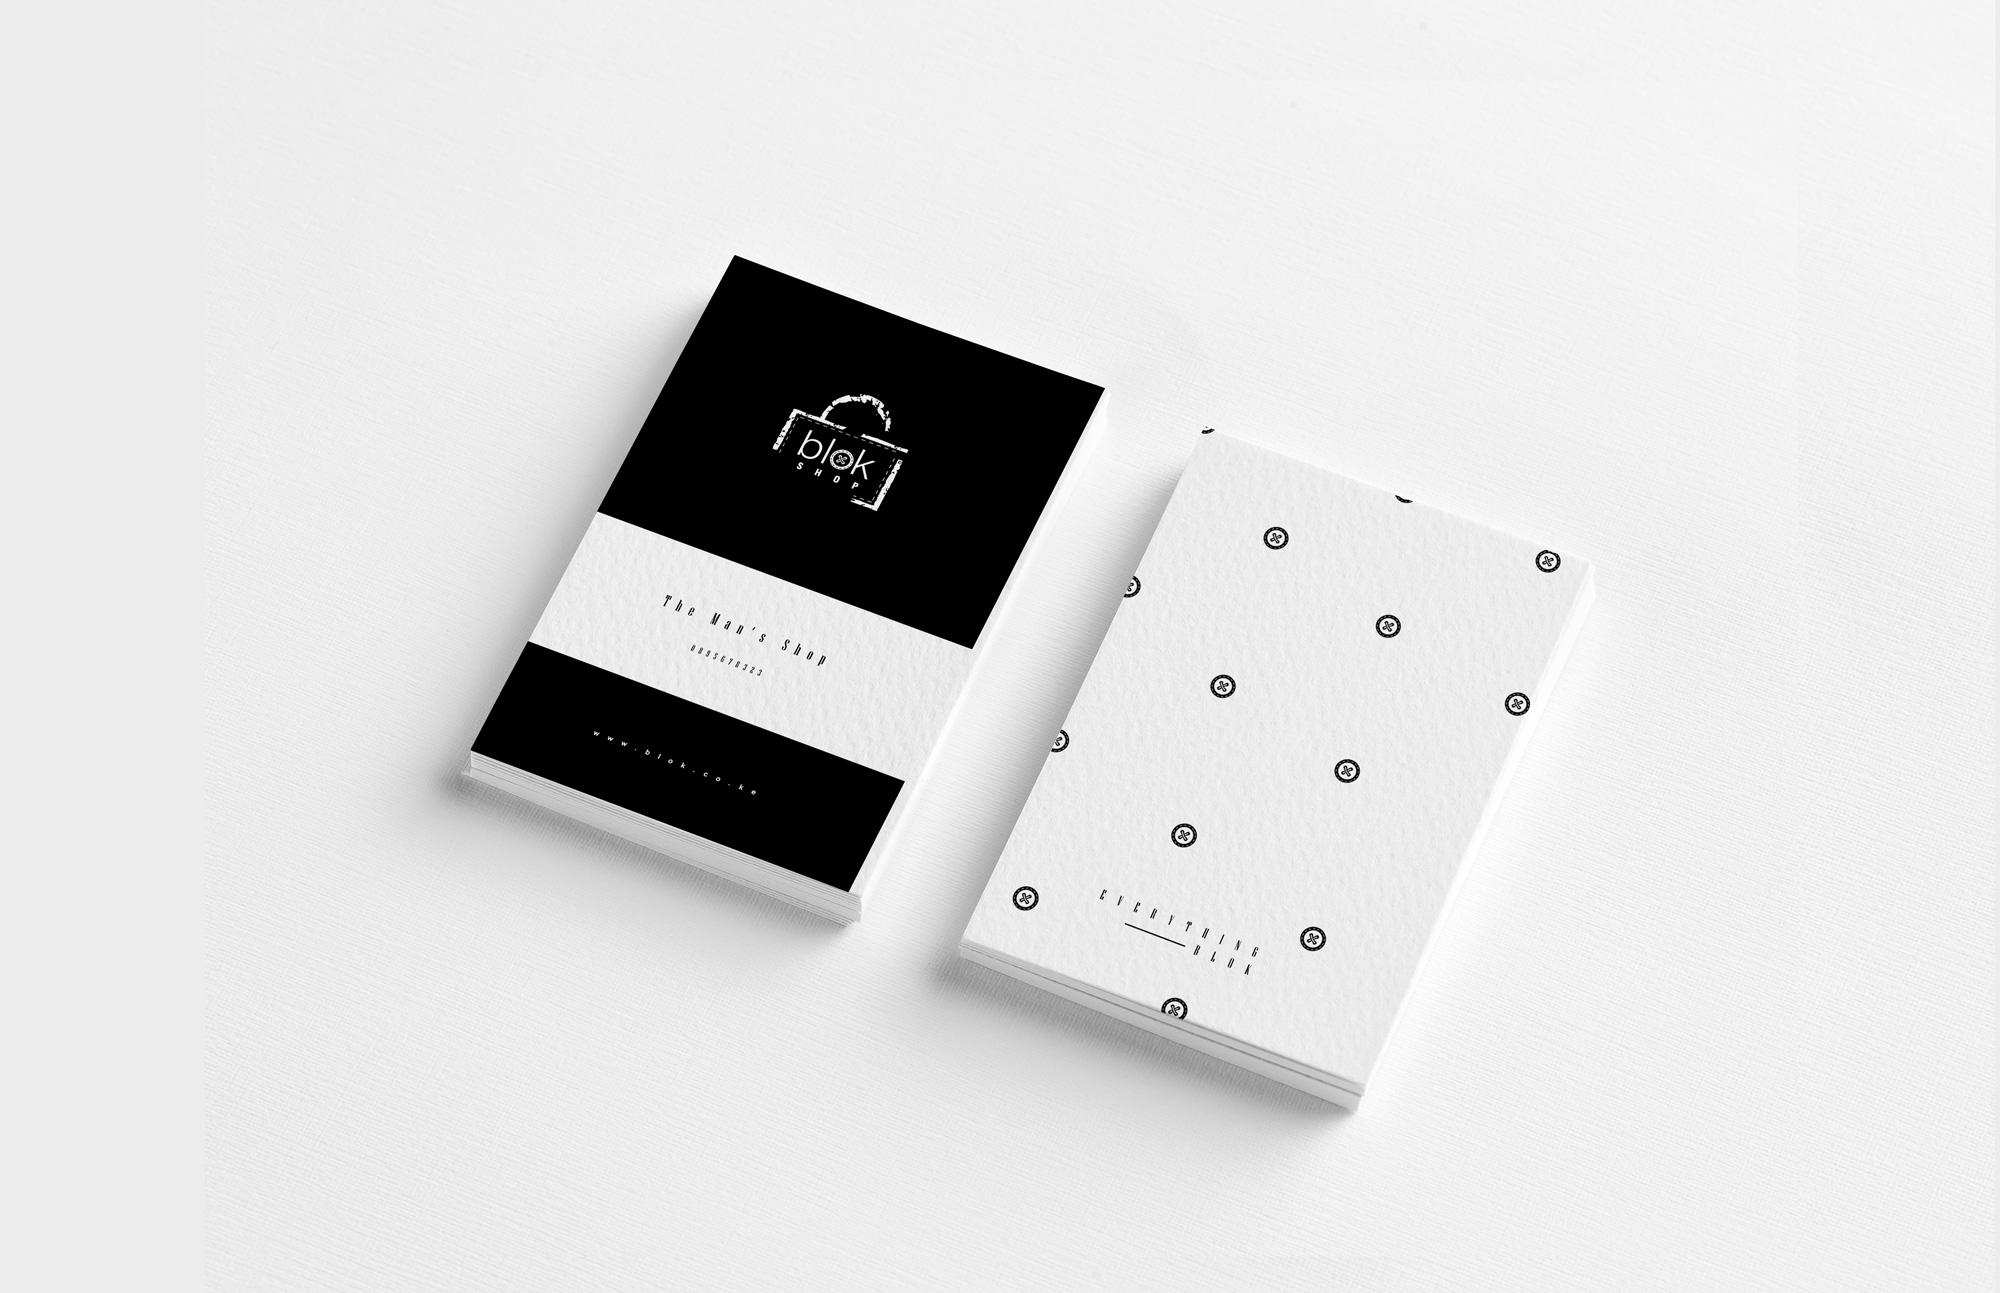 Blok Shop Product Branding